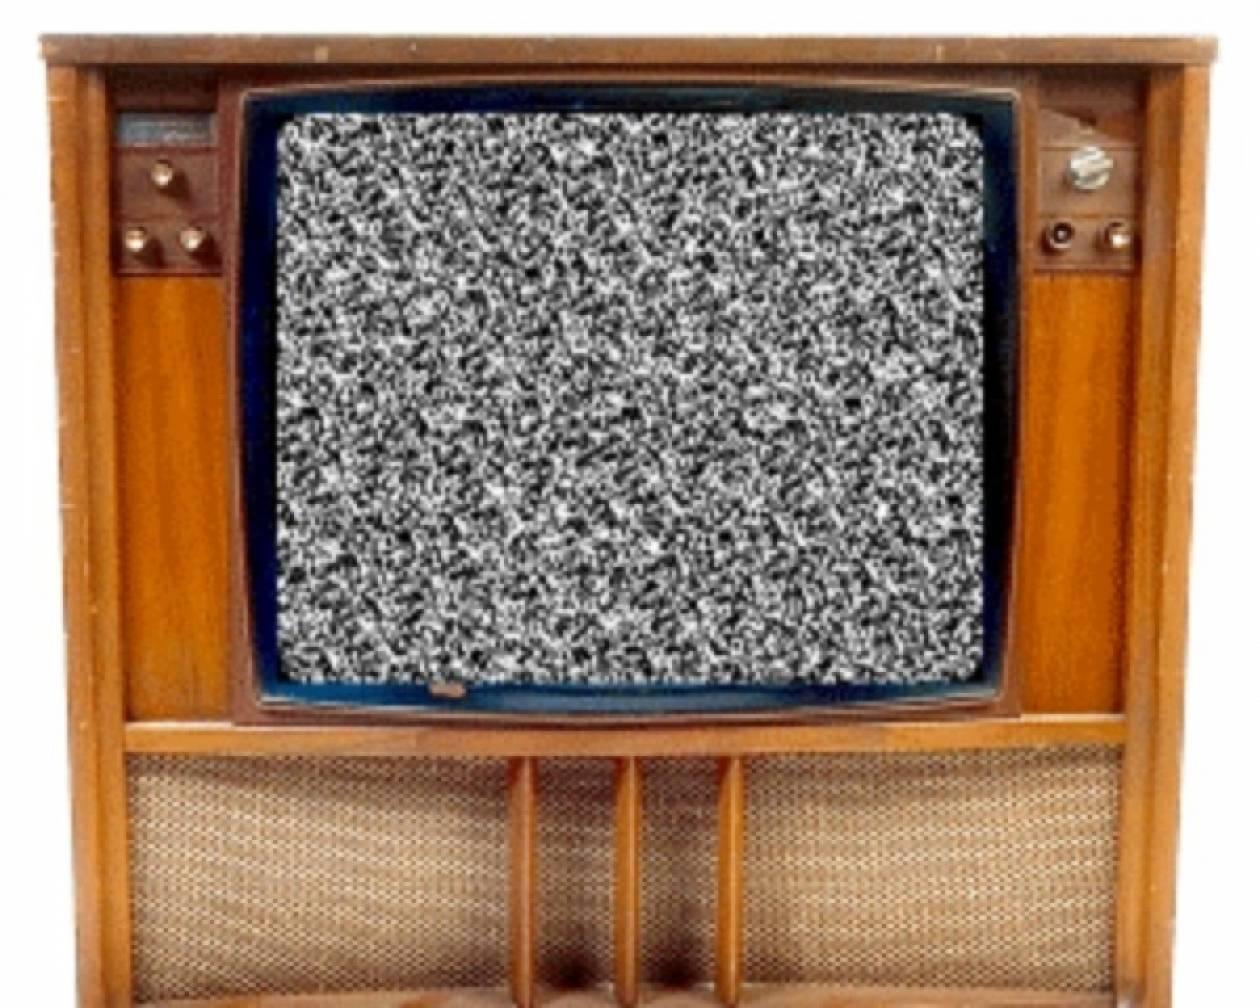 Kι όμως υπάρχει: Παγκόσμια Ημέρα Τηλεόρασης σήμερα!